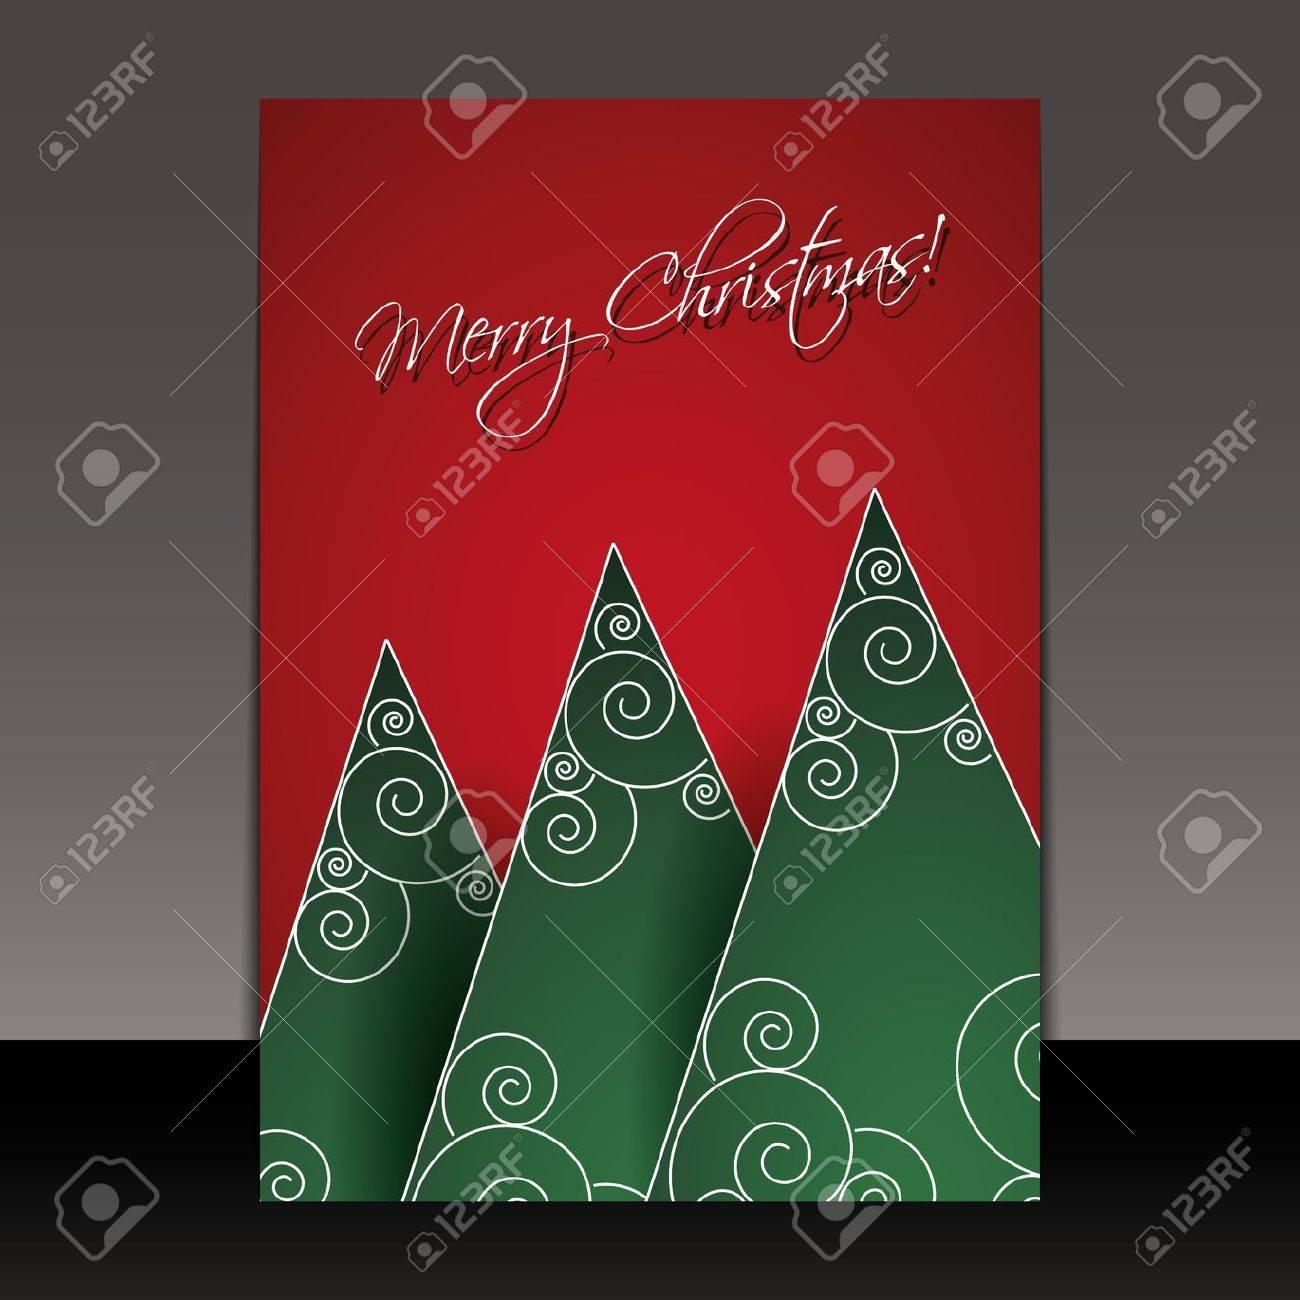 Christmas Card, Flyer or Cover Design Stock Vector - 16007425